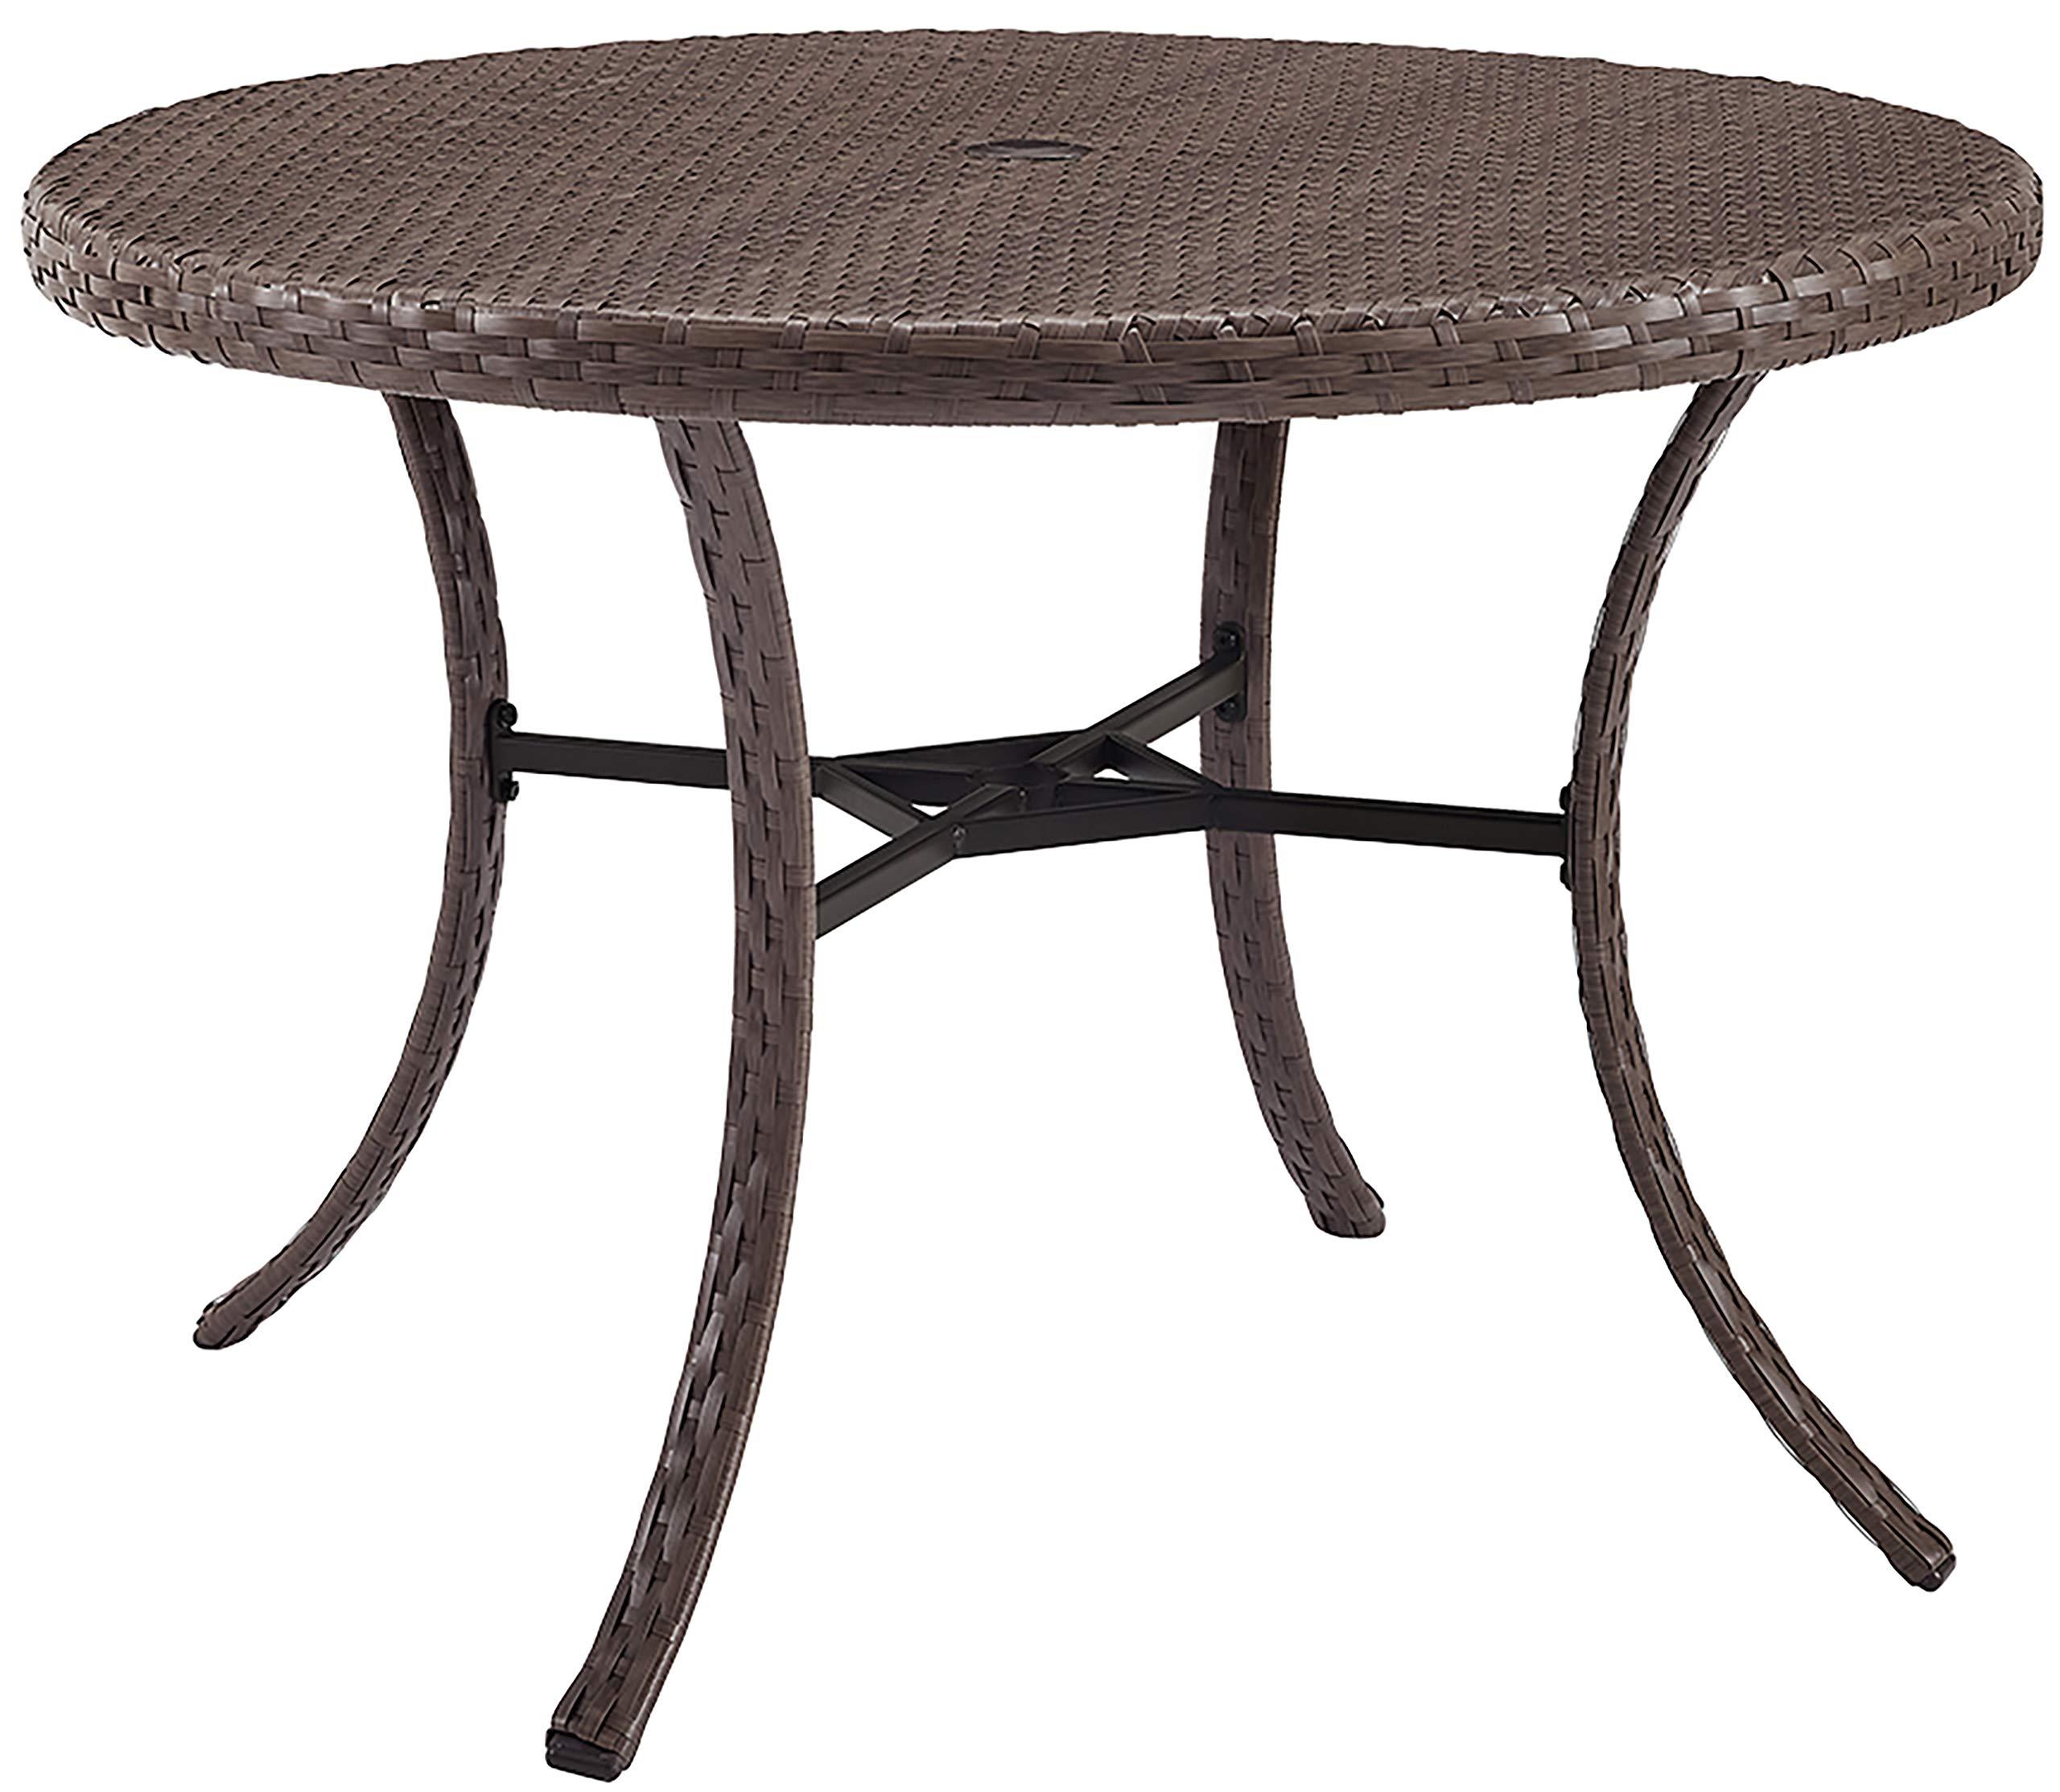 Cheap Wicker Dining Chairs: CHEAP Crosley Furniture KO70154DW-SA Tribeca Outdoor